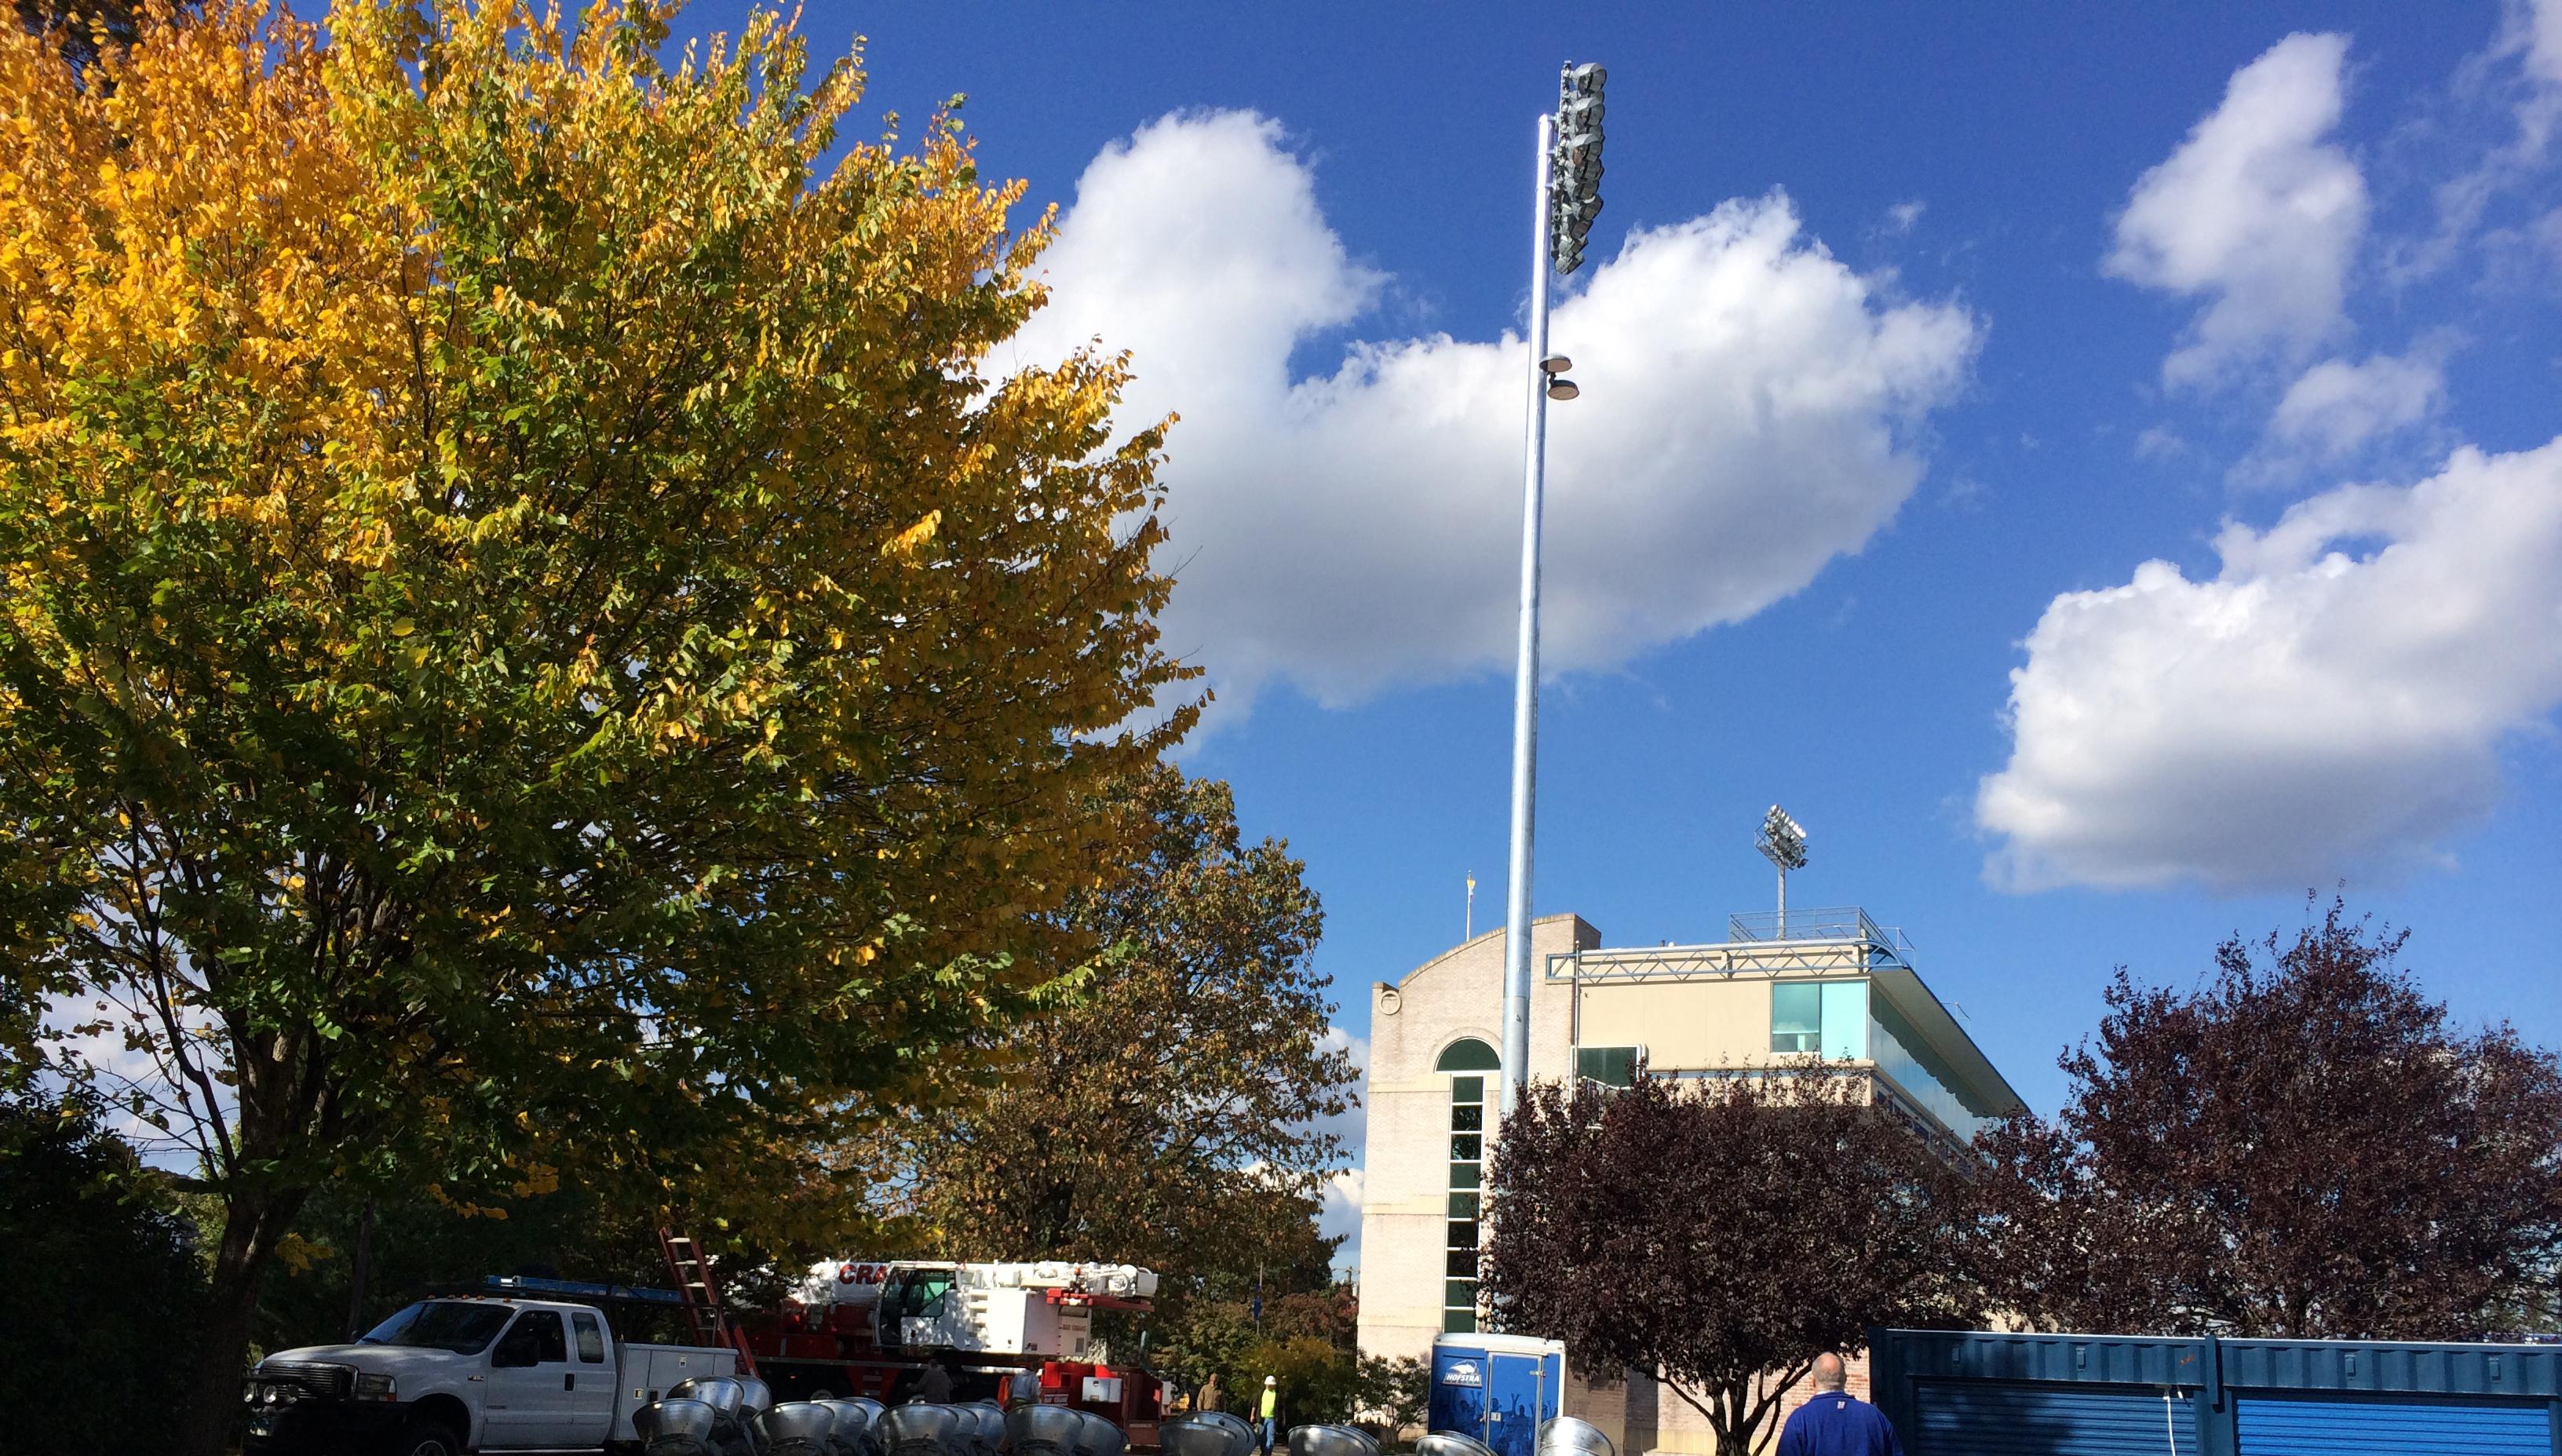 New Lights Installed At James M. Shuart Stadium